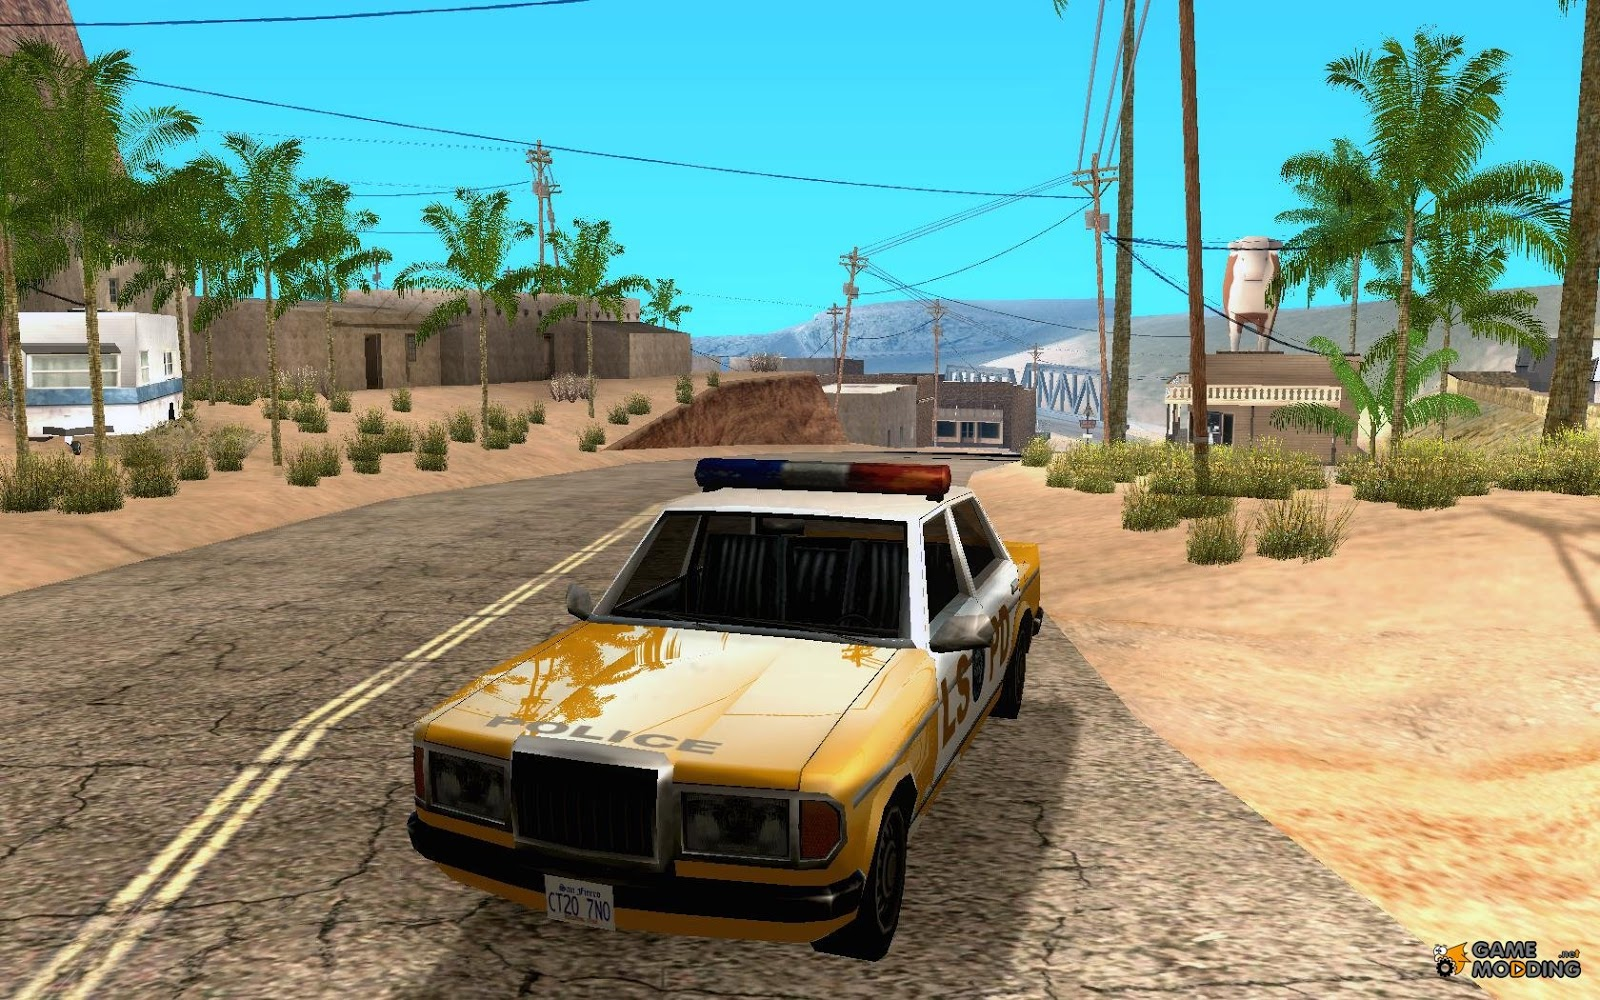 🔥 Cleo gta san andreas apkpure | Grand Theft Auto: San Andreas v1